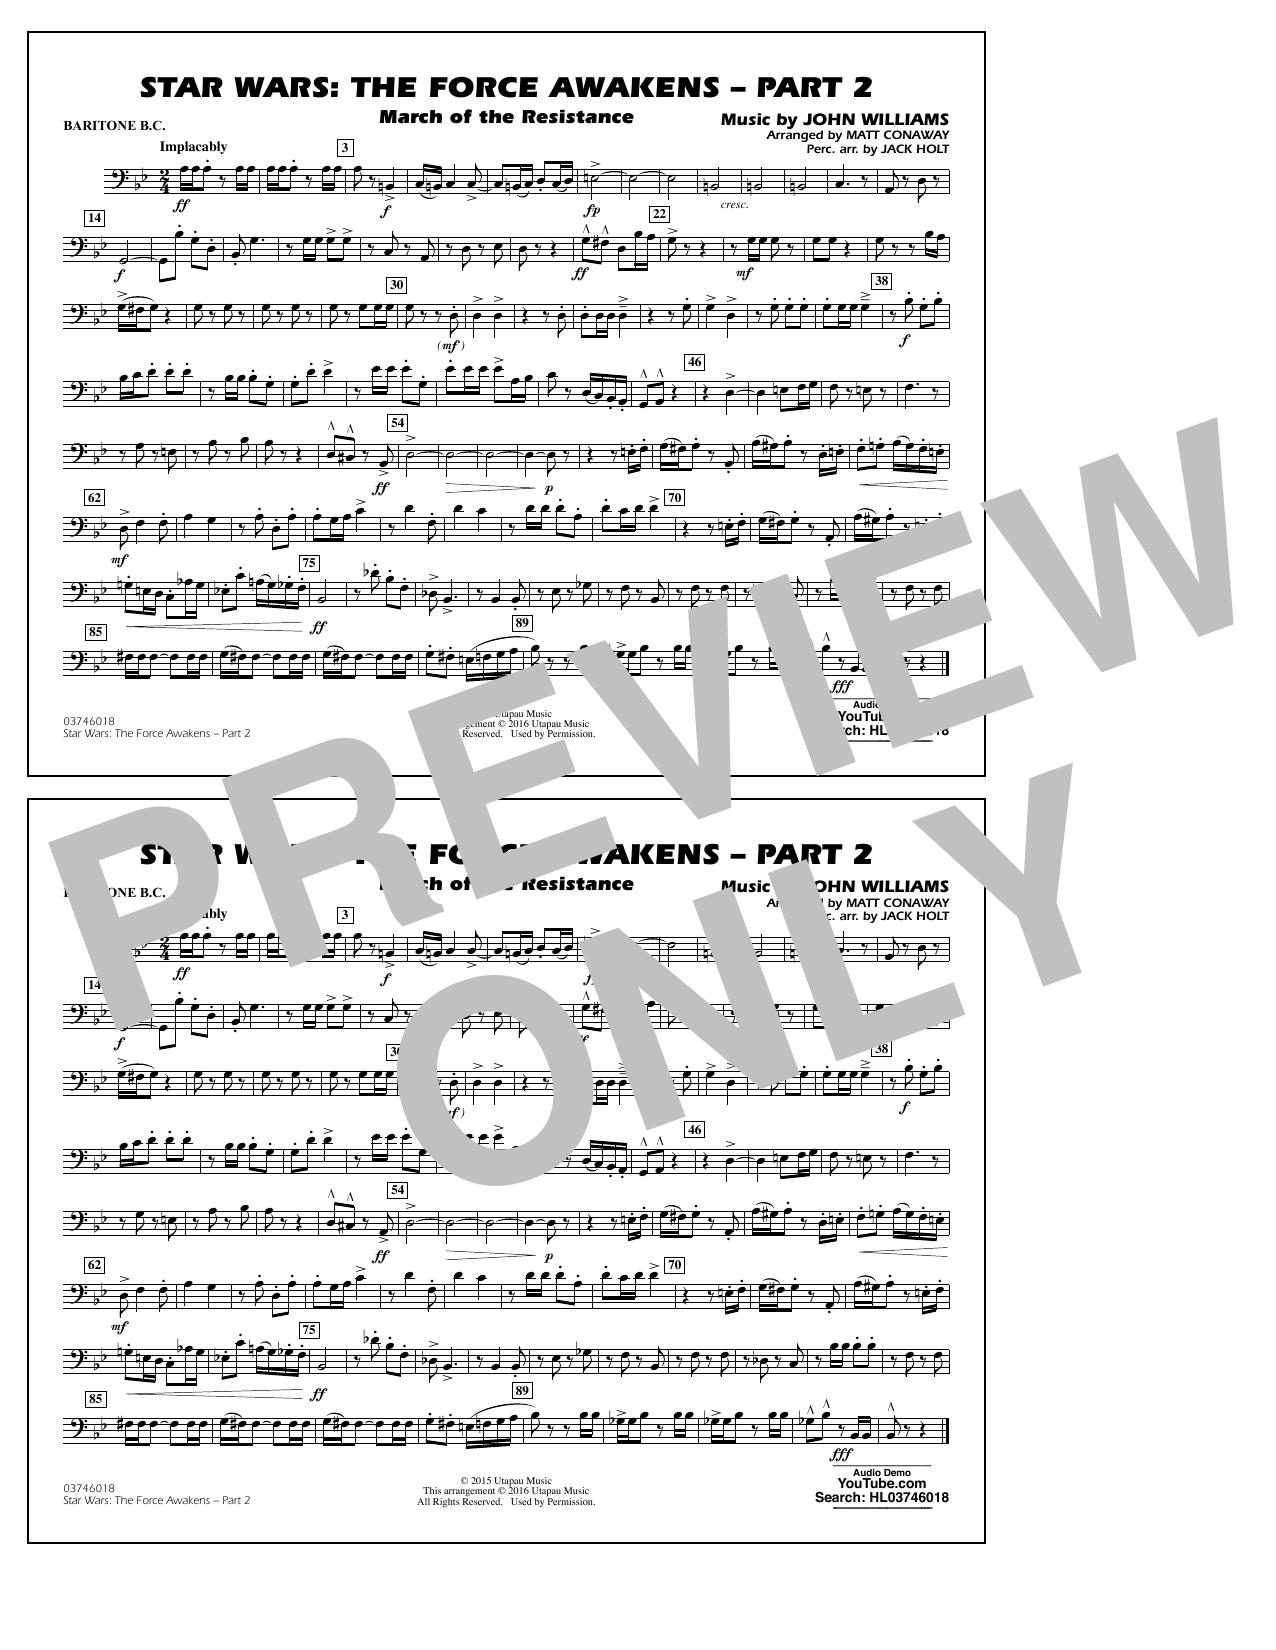 Star Wars: The Force Awakens - Part 2 - Baritone B.C. (Marching Band)